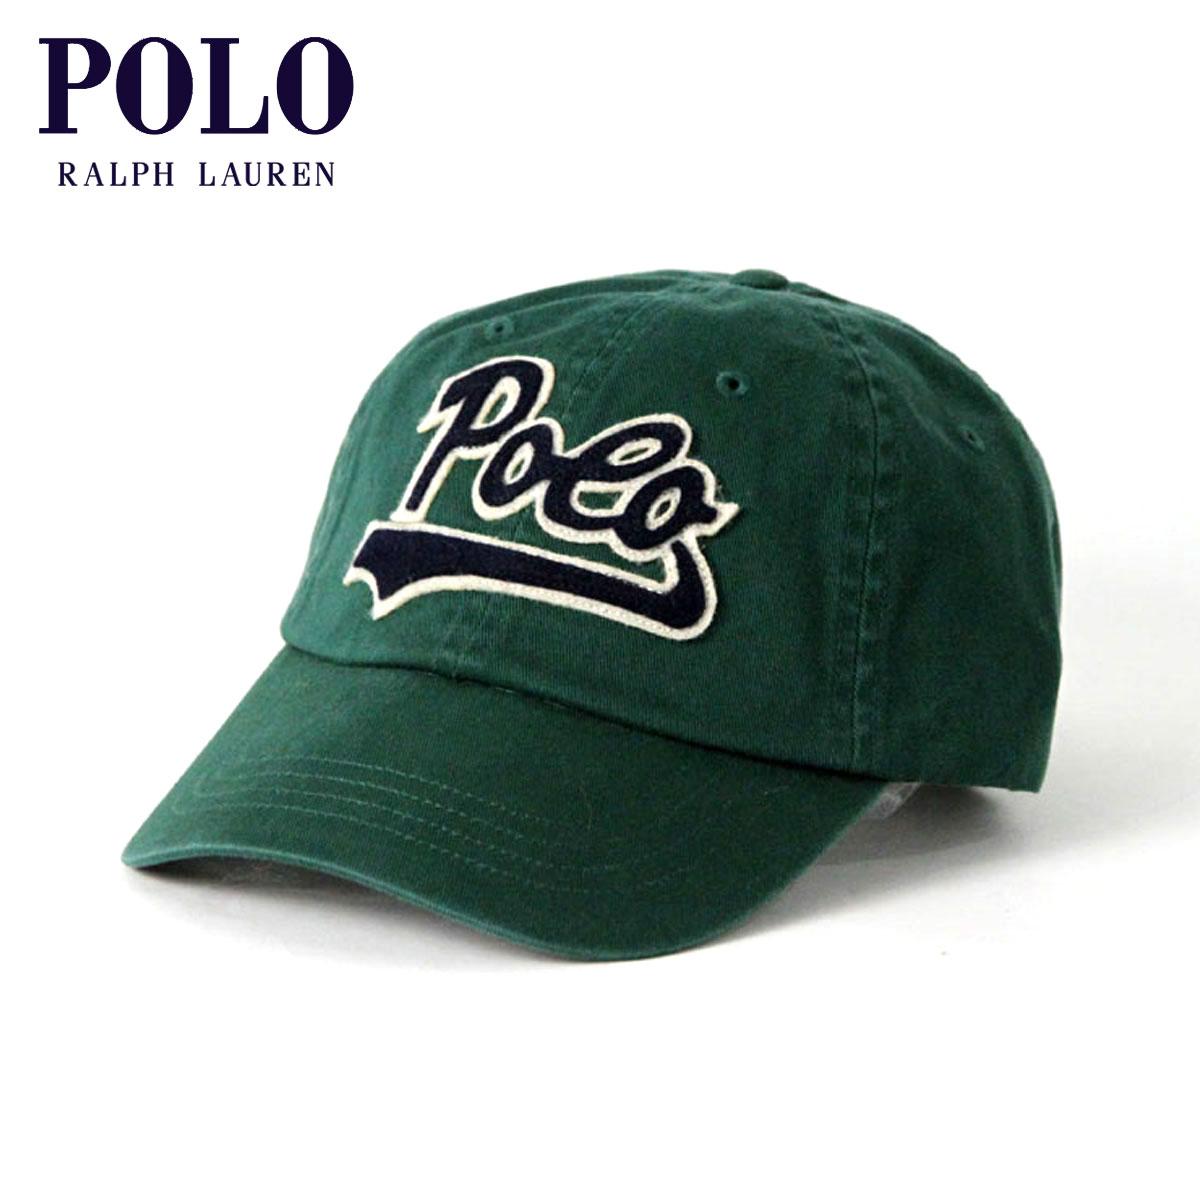 e2d310548427b Polo Ralph Lauren POLO RALPH LAUREN regular article men hat cap SCRIPT  COTTON CAP D00S20